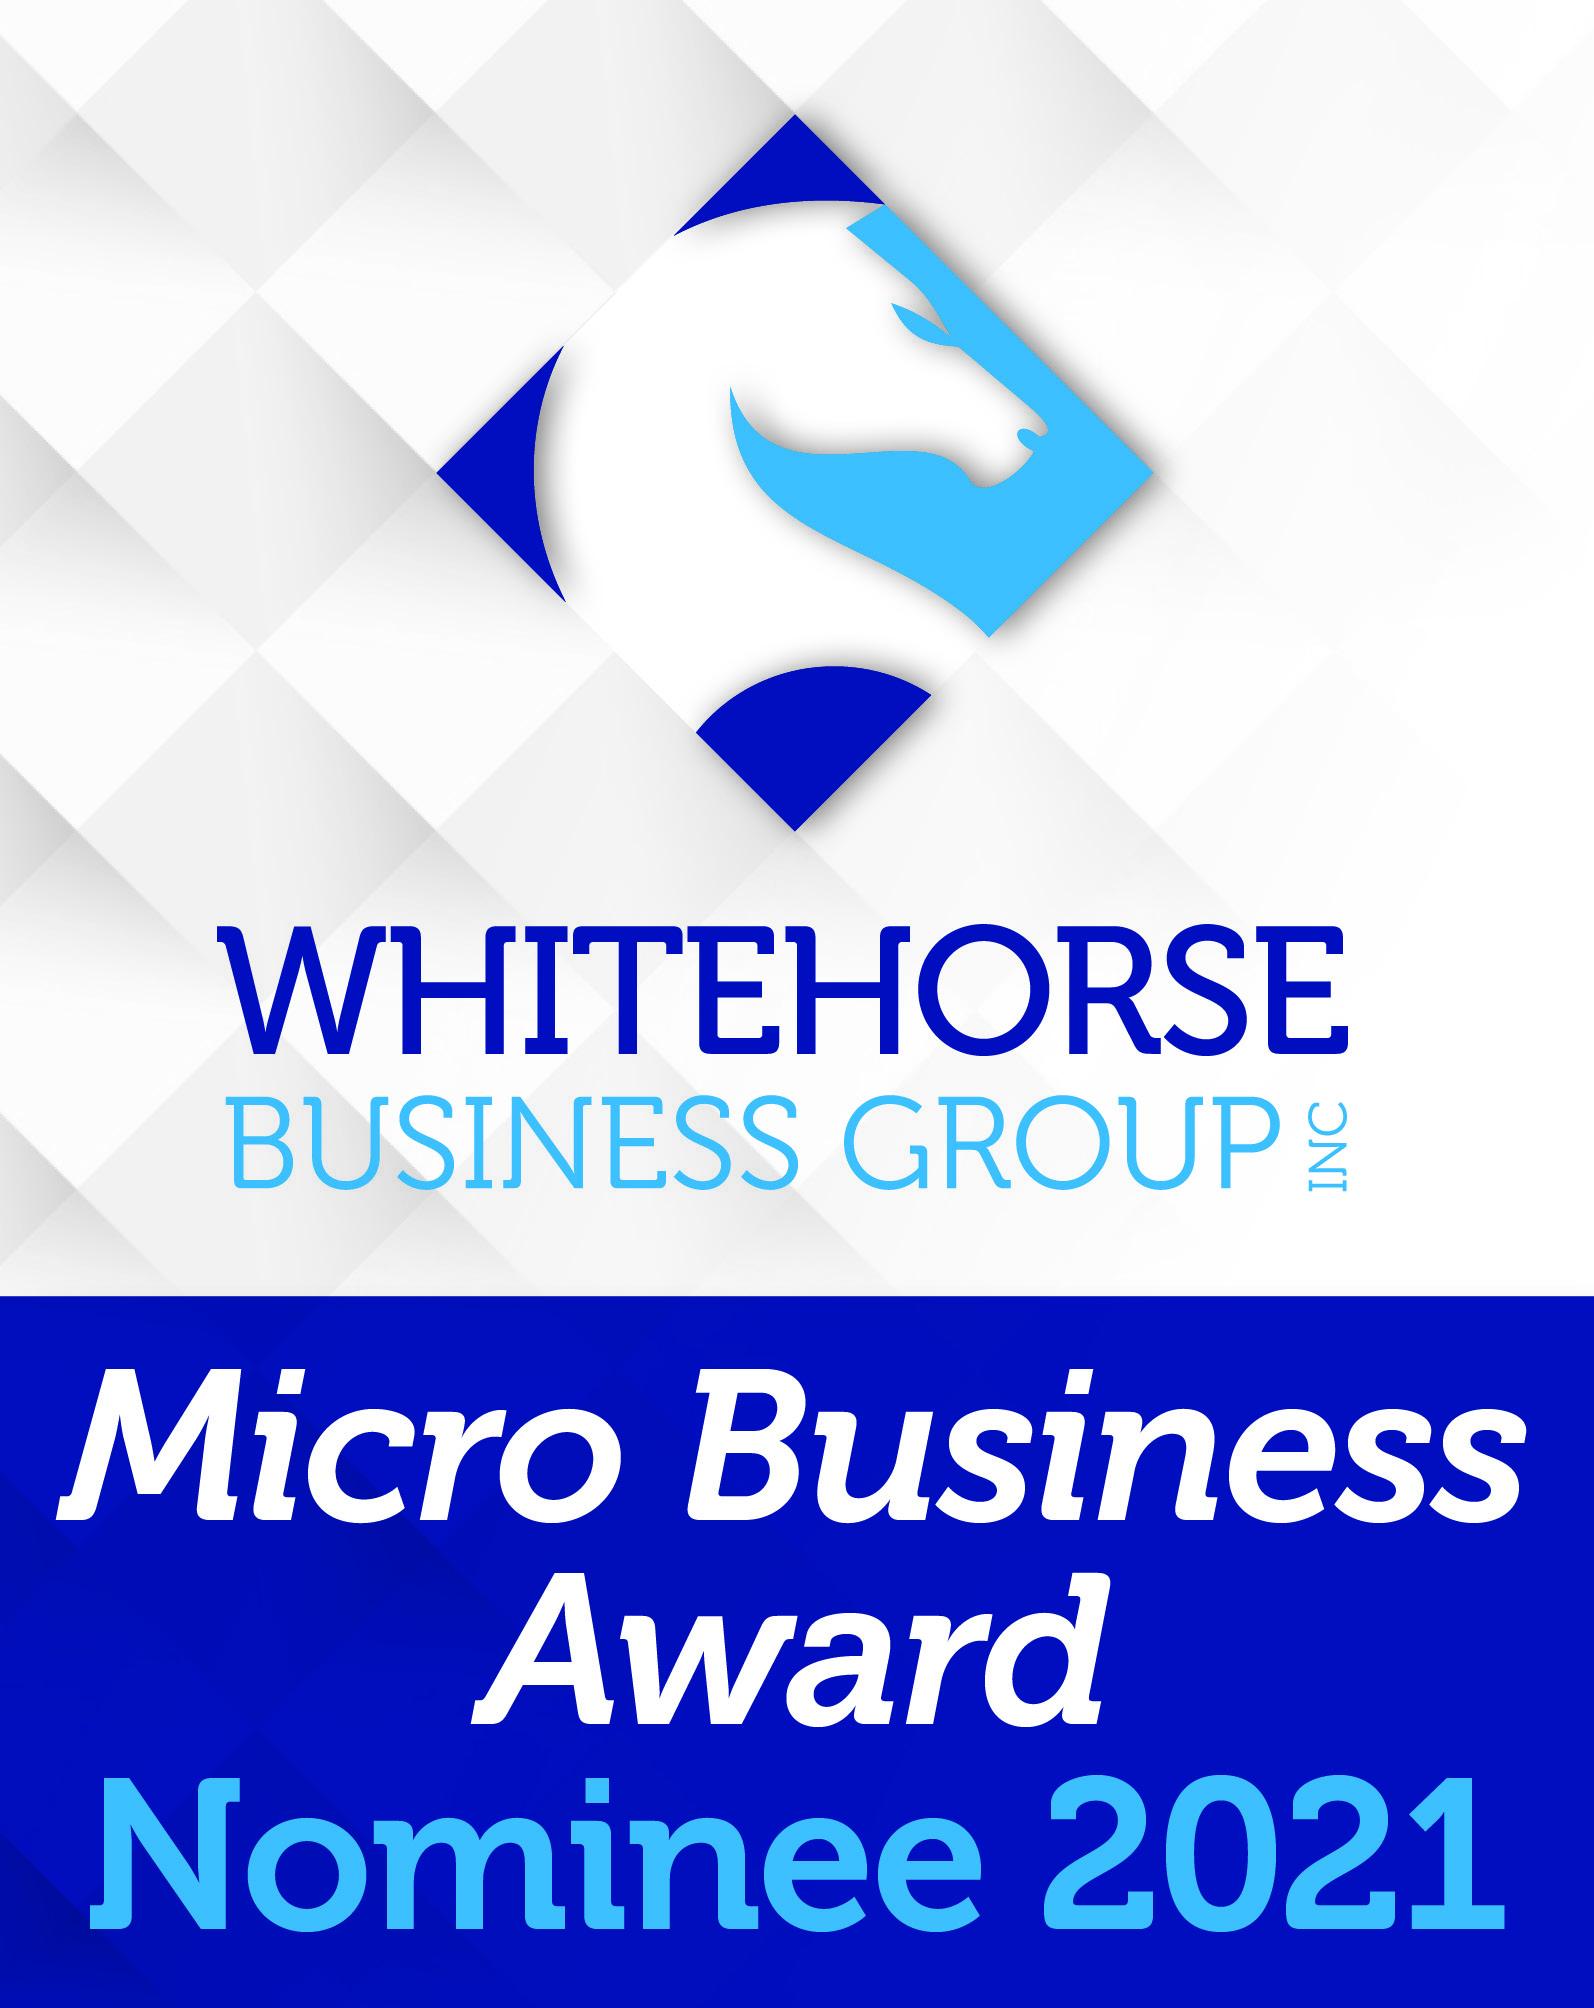 Whitehorse Business group logo